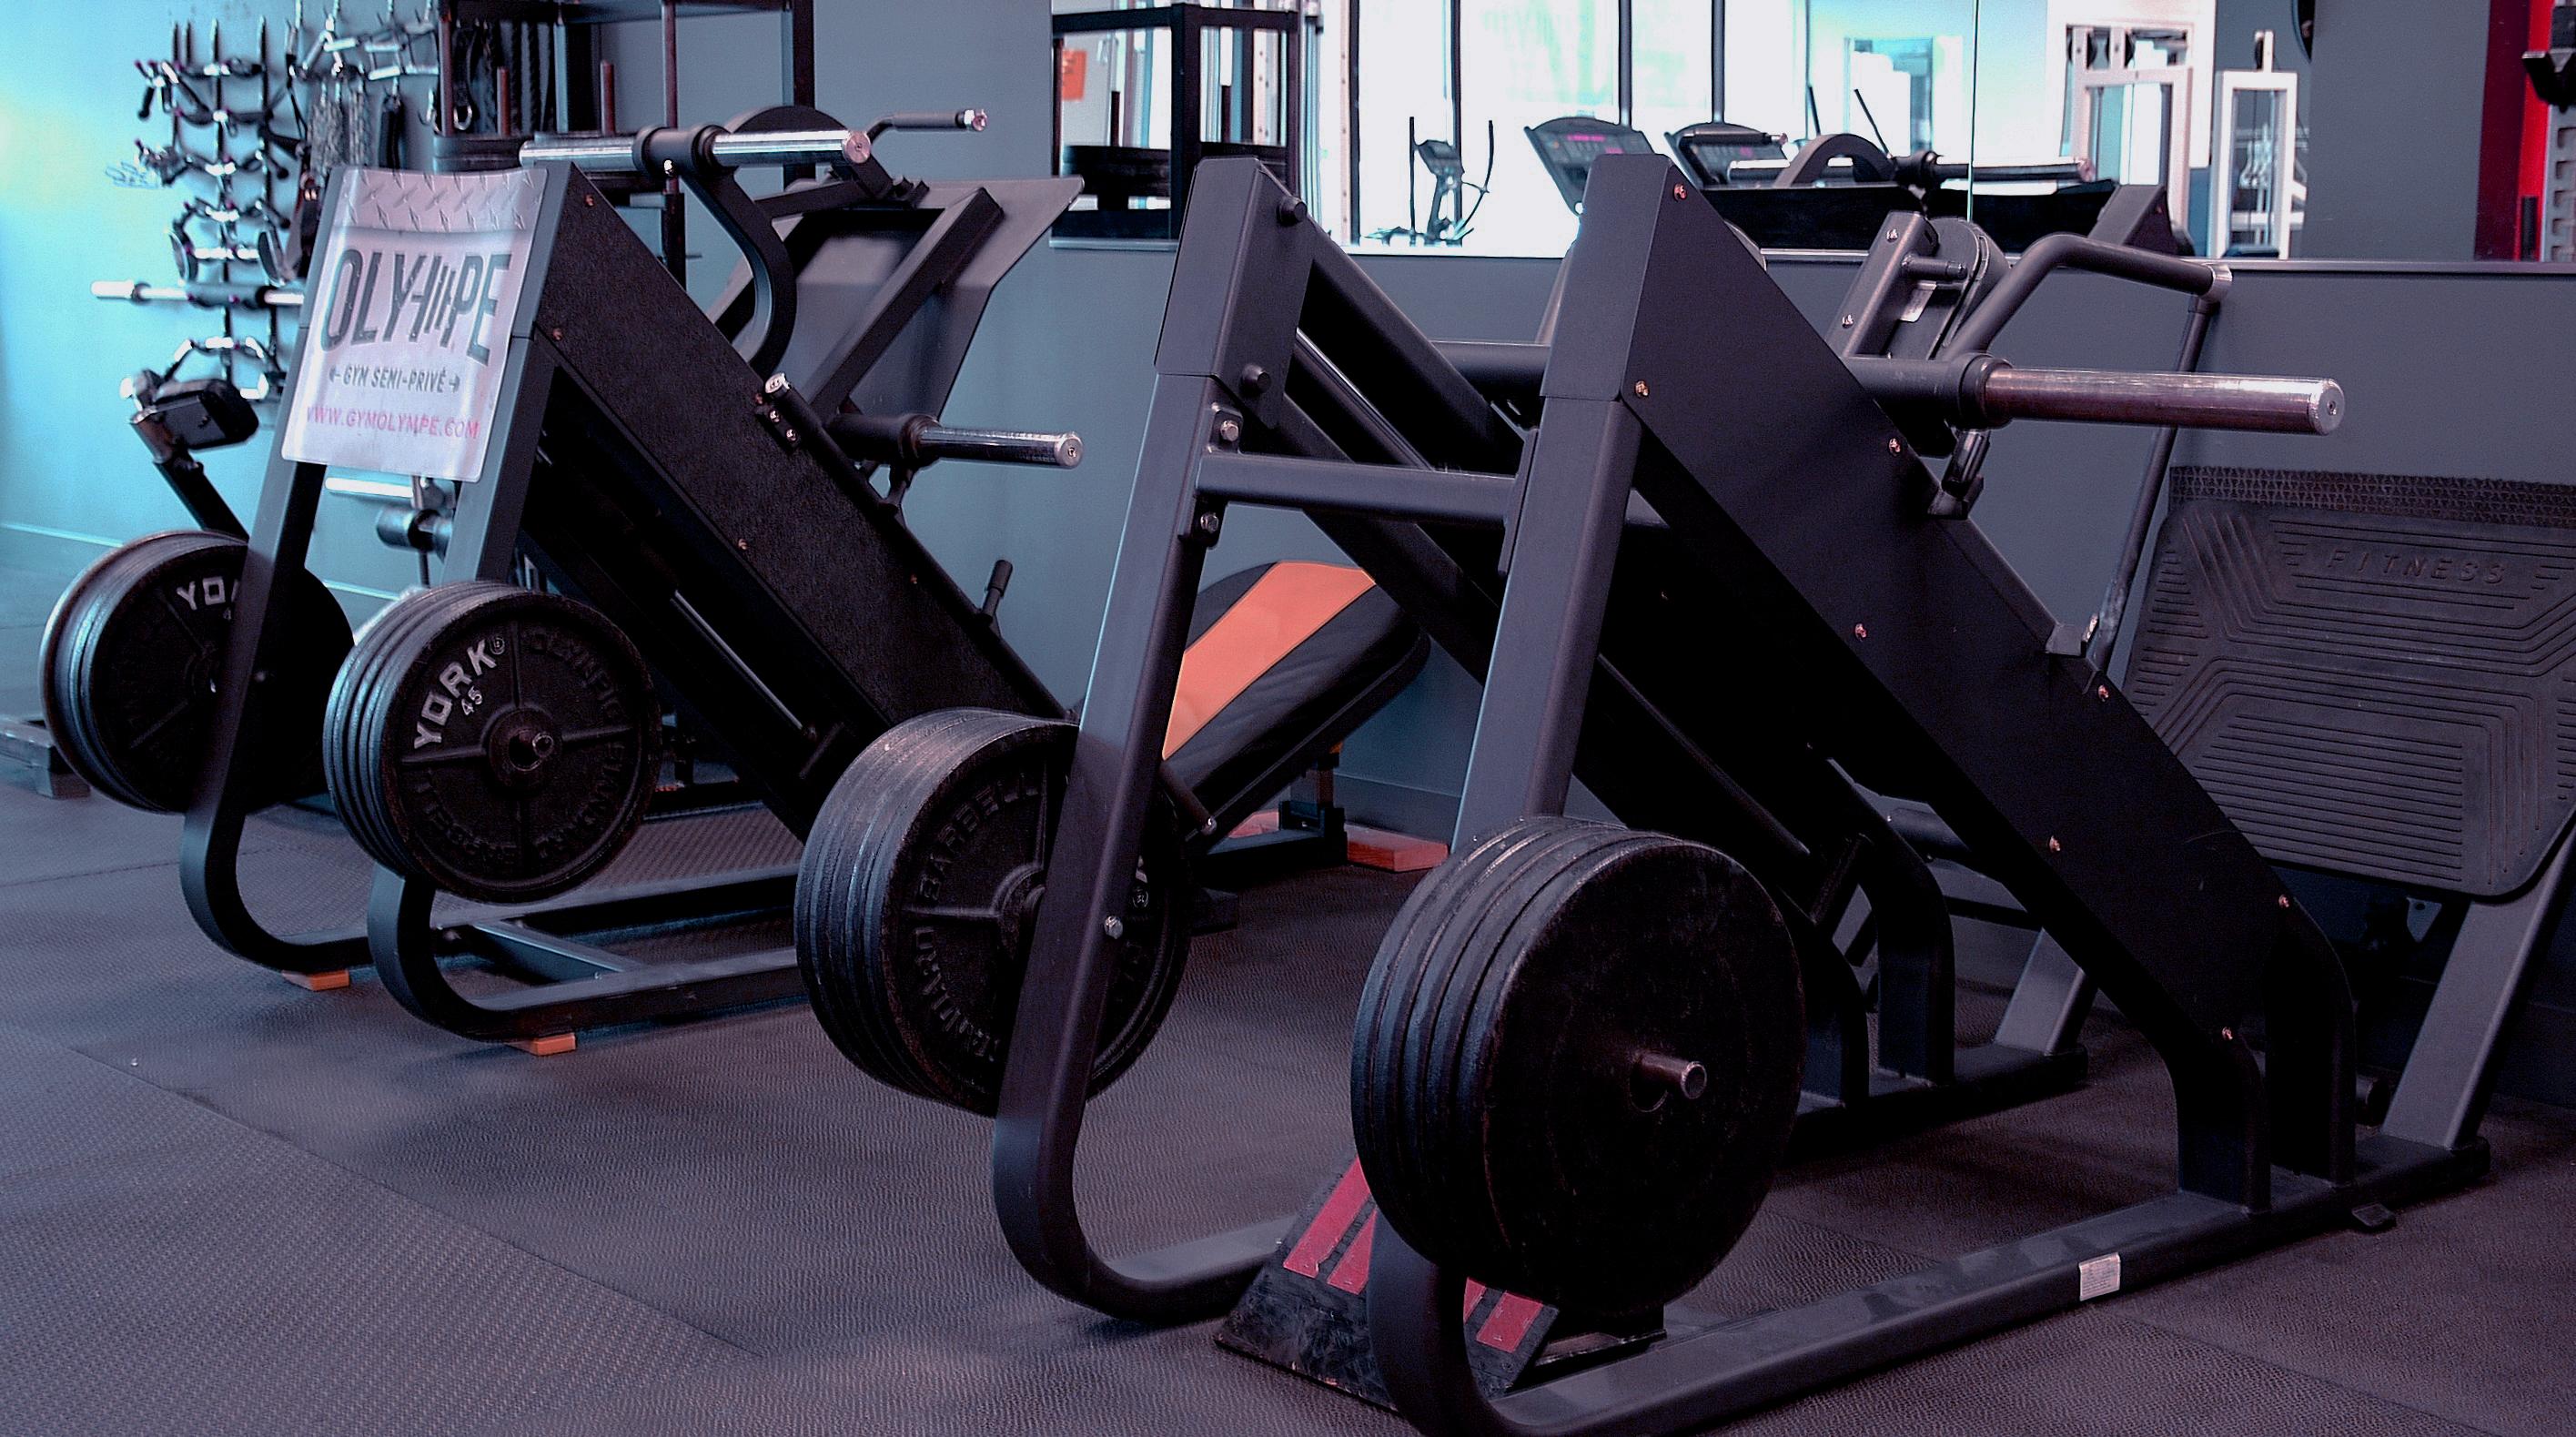 Gym pour Claude 009